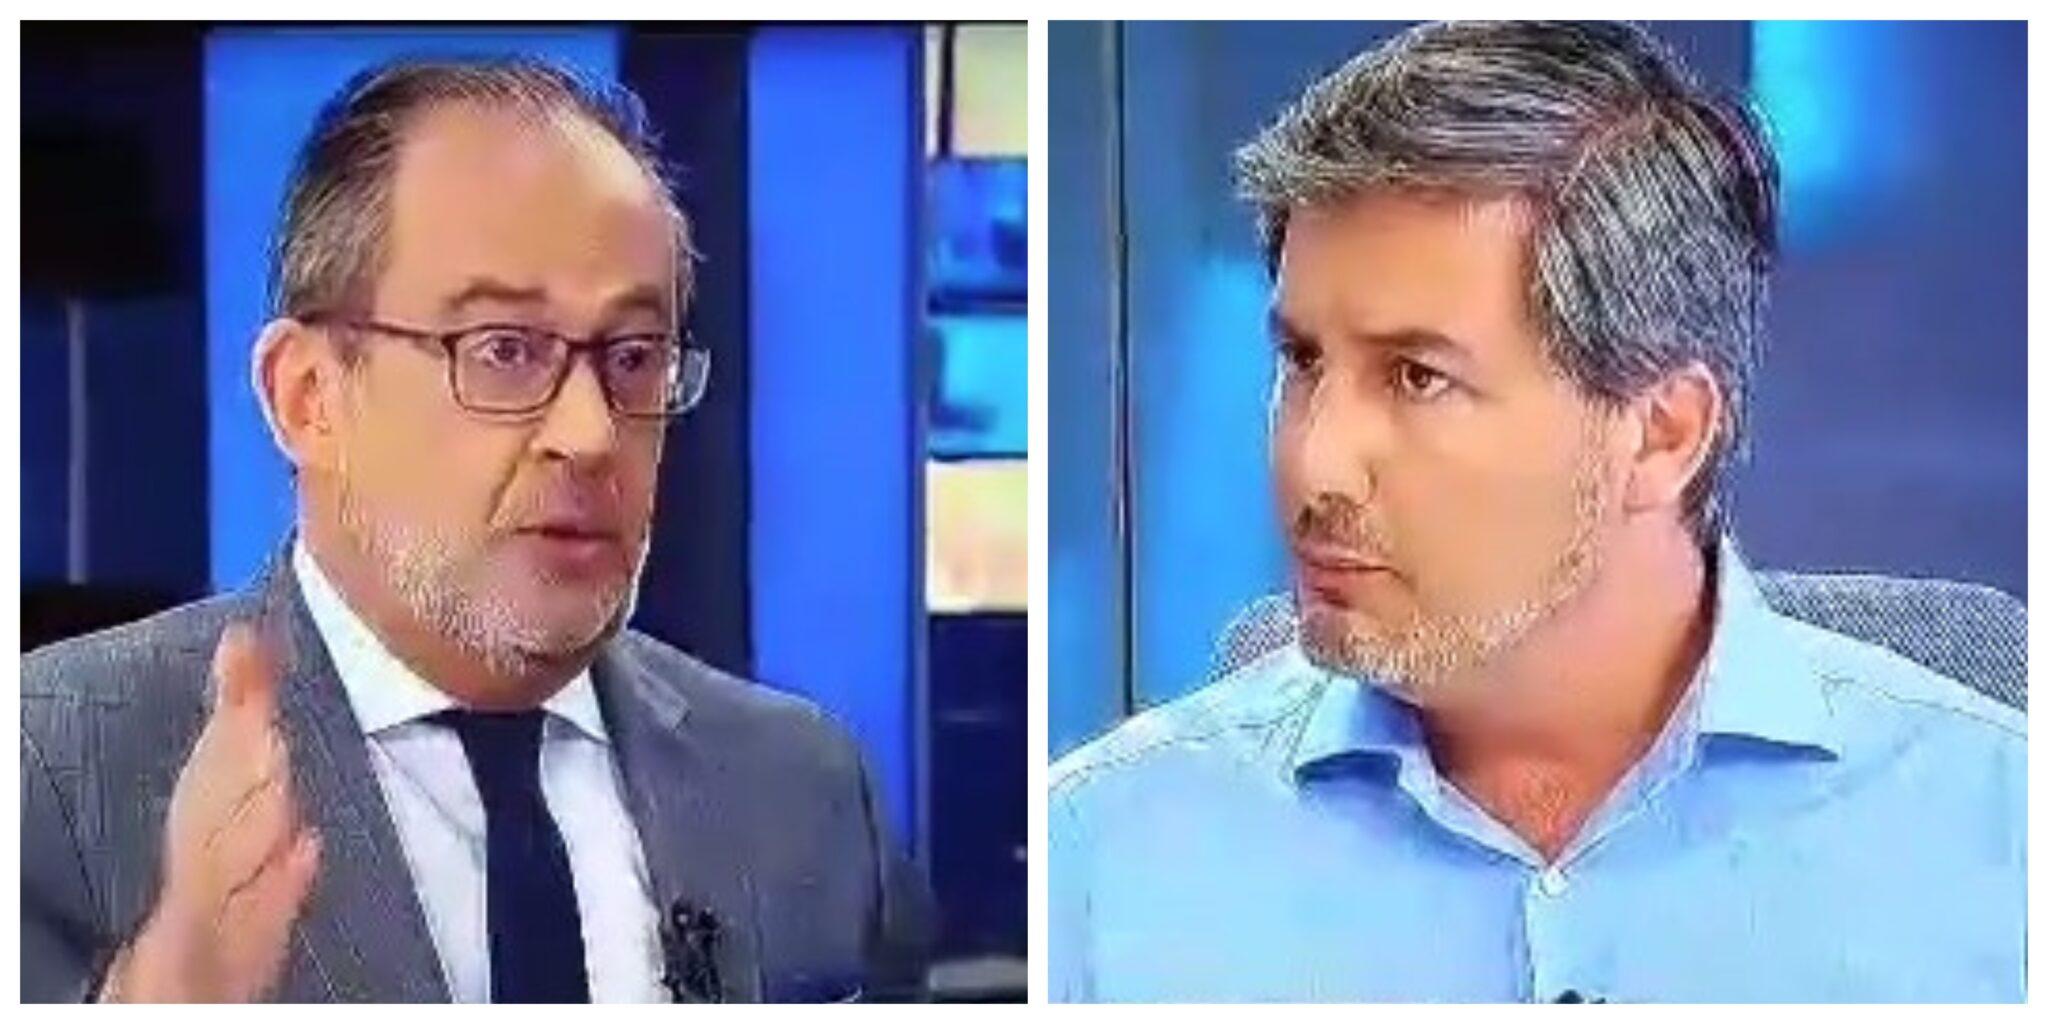 josealbertocarvalho brunodecarvalho scaled Ânimos exaltados na entrevista de José Alberto Carvalho a Bruno de Carvalho